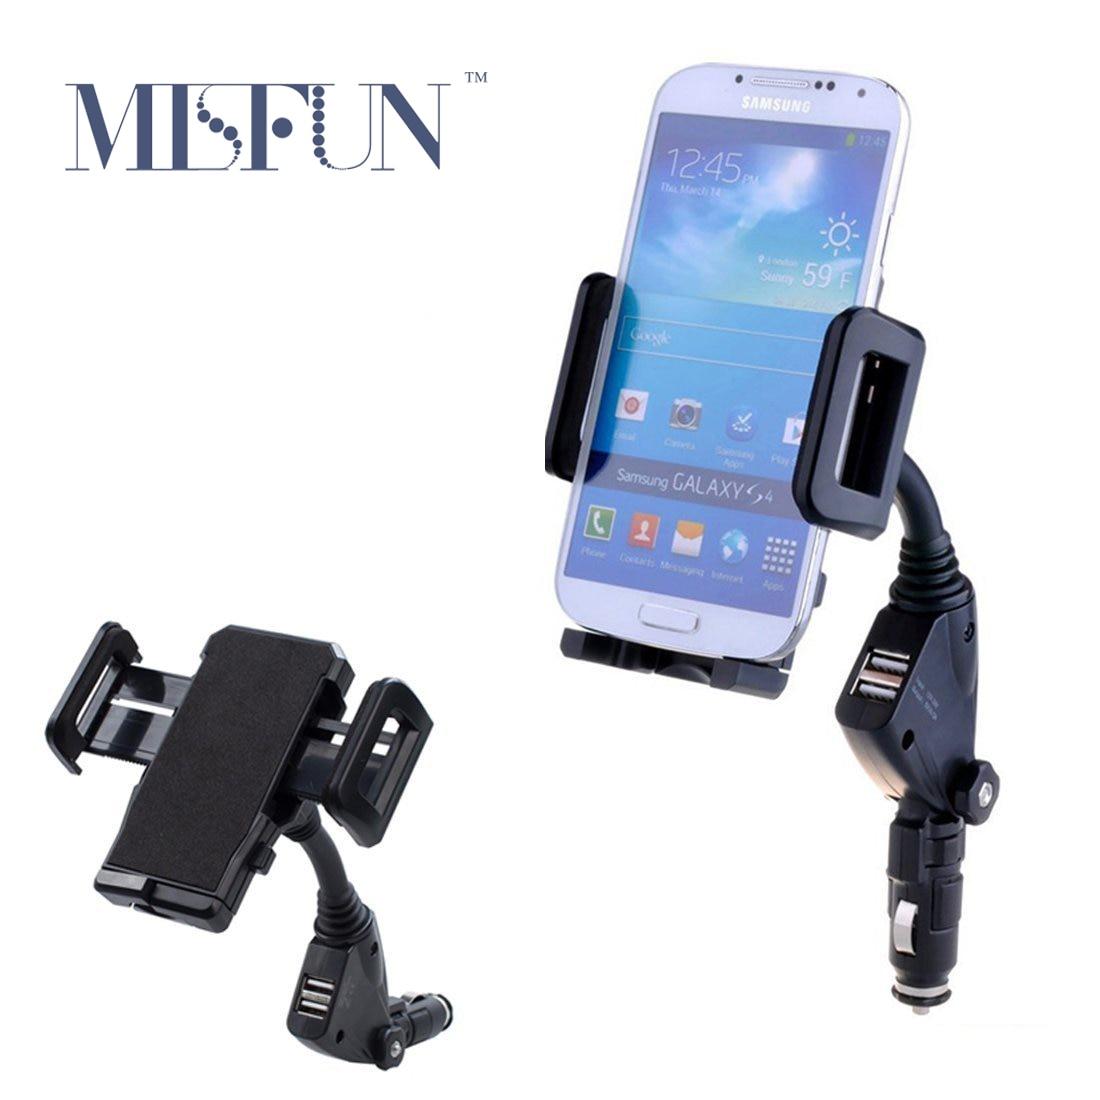 Aliexpress com buy universal car mobile phone holder stand cigarrette lighter 2 ports usb